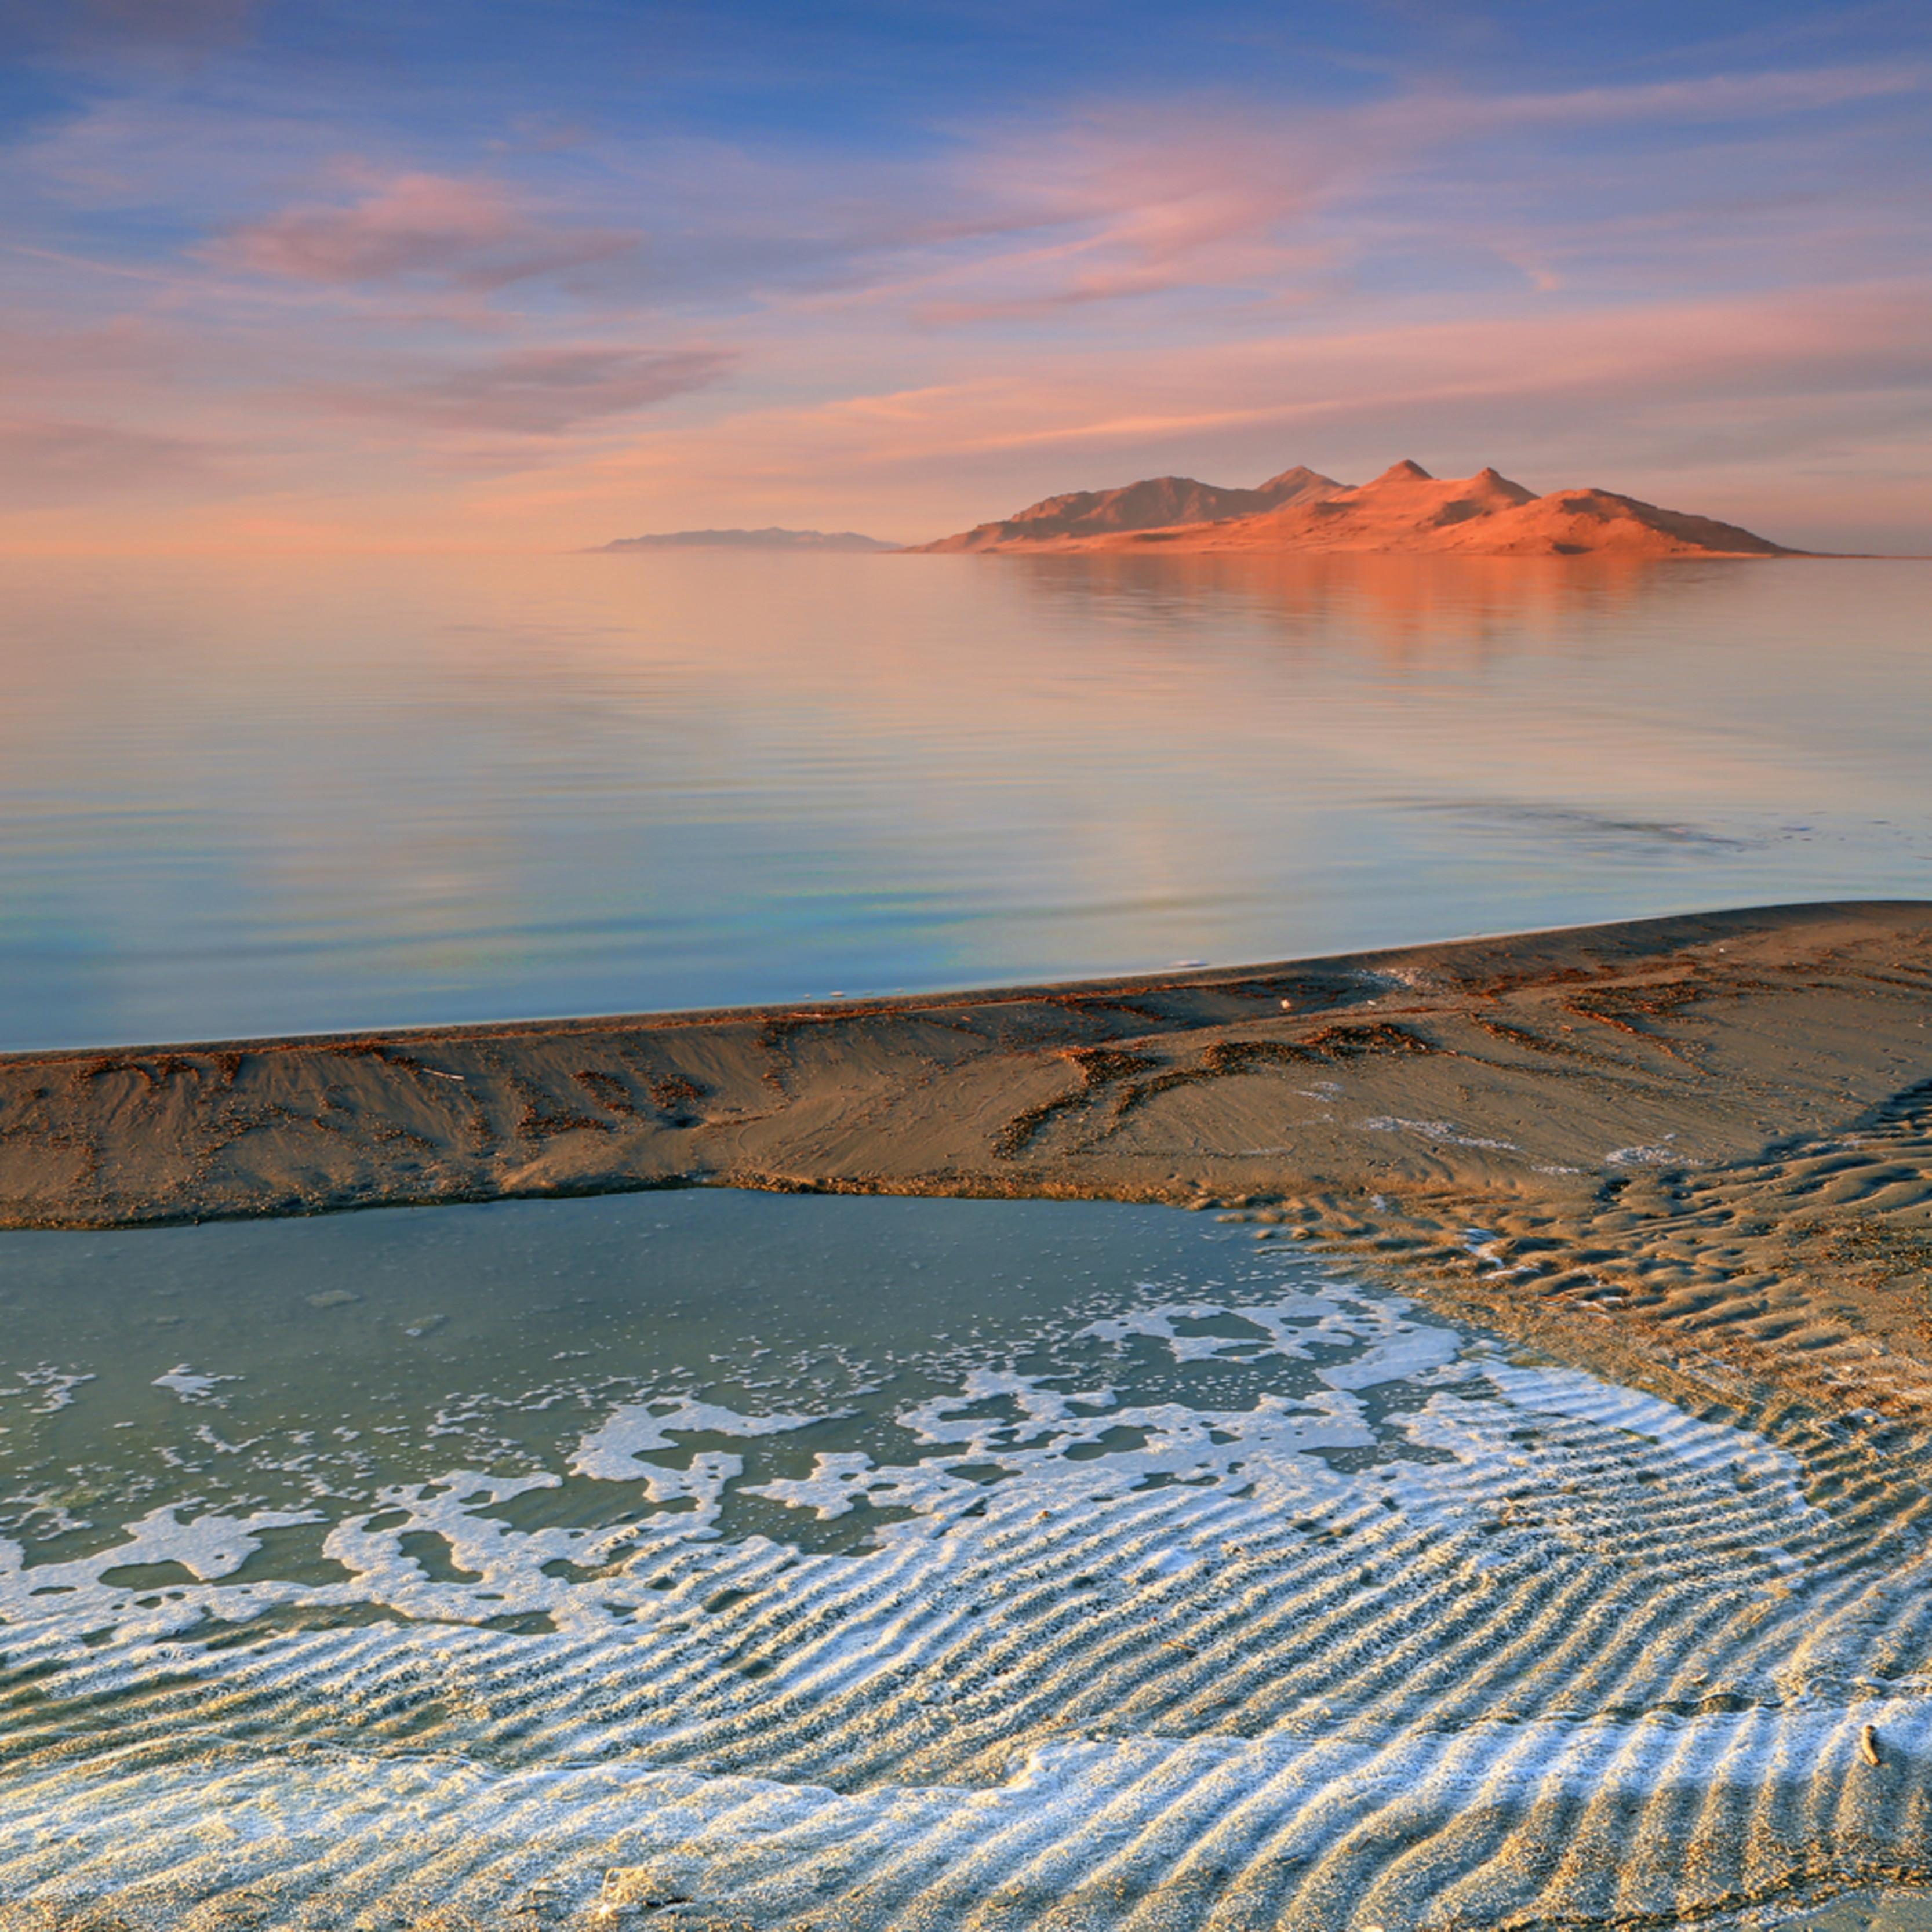 Sunset at the great salt lake q0corg